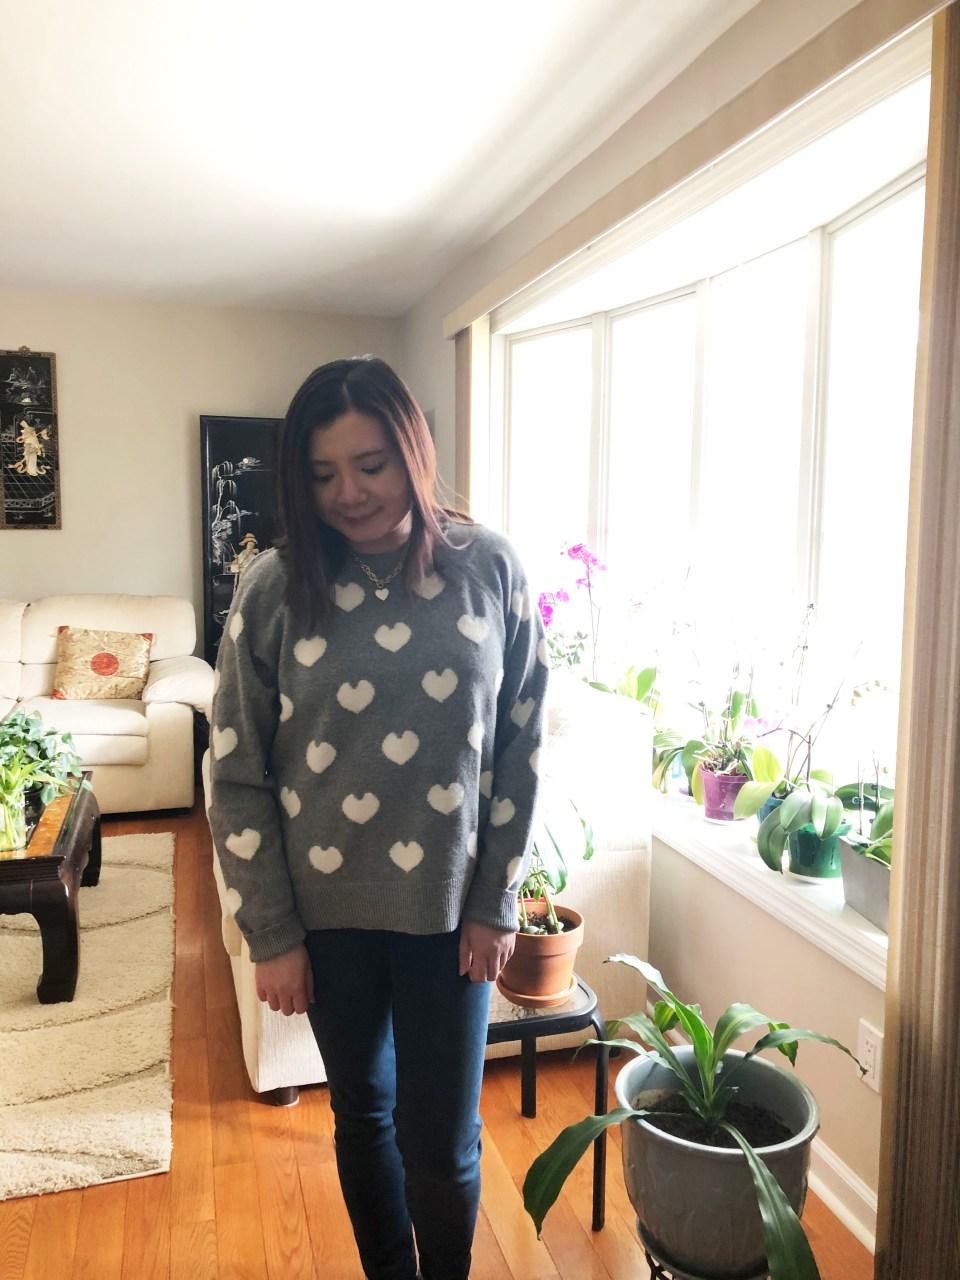 White Heart Sweater 11